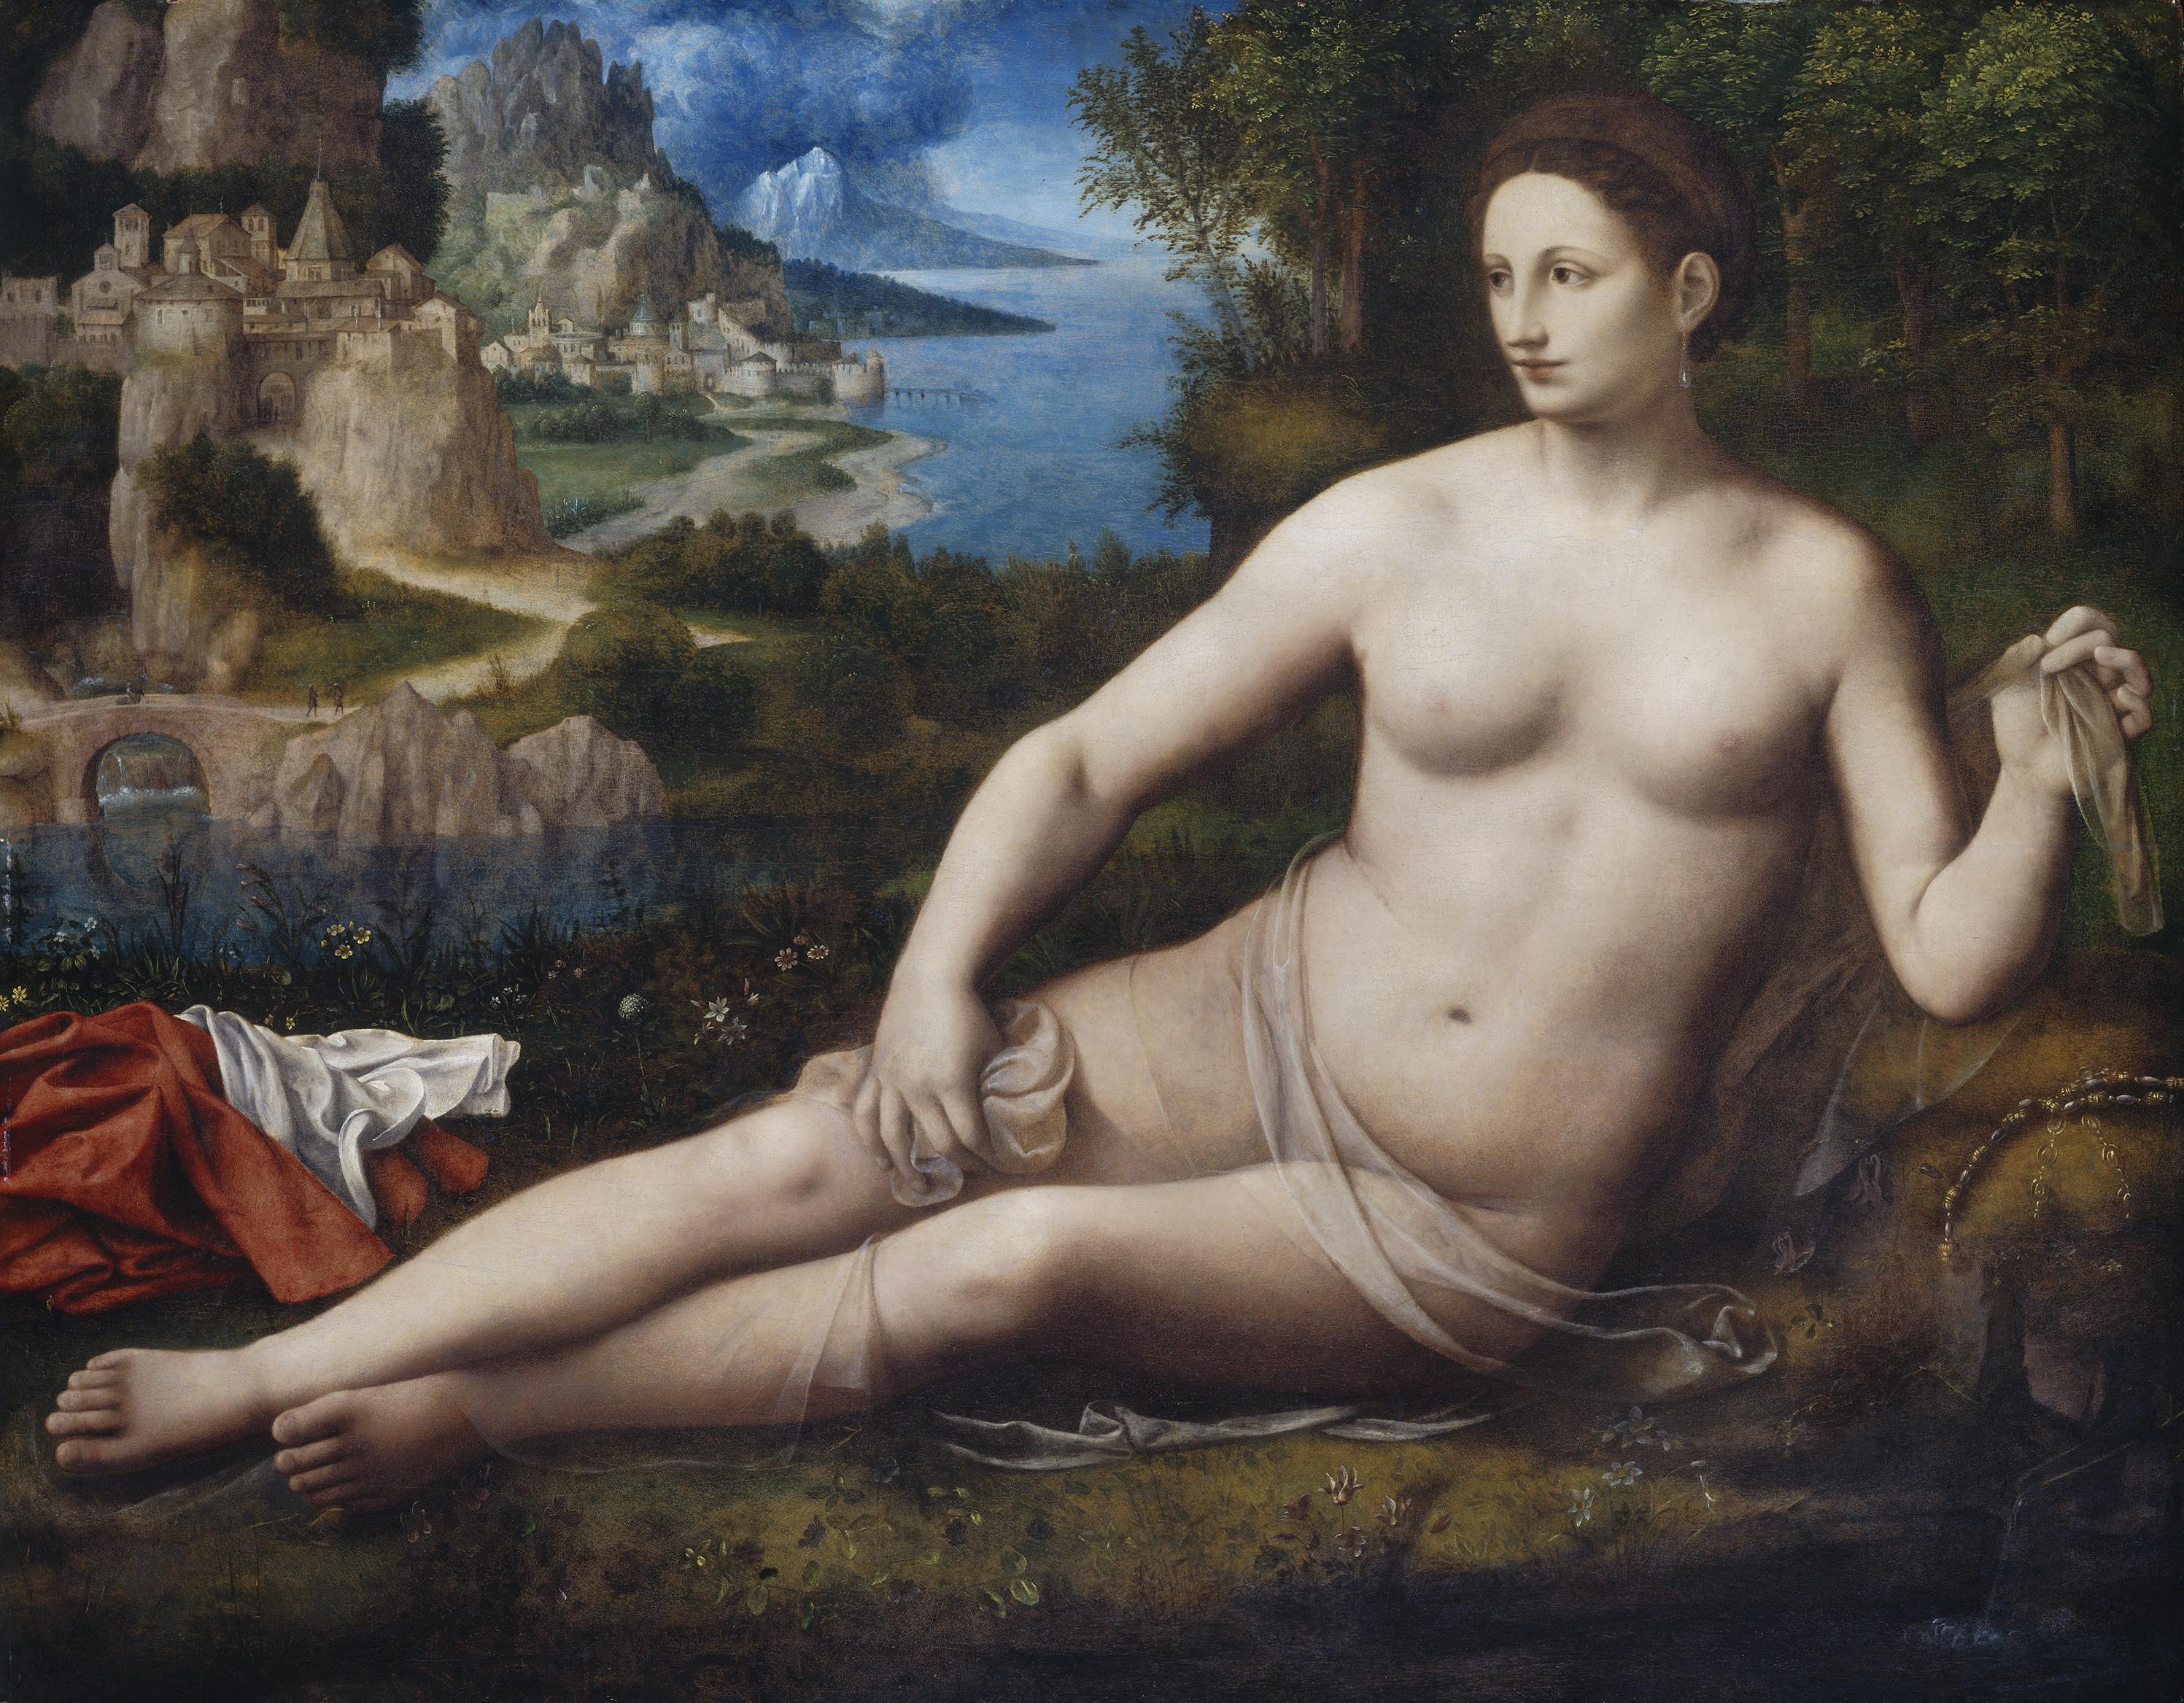 Bernardino Luini, 1480-1485 - 1532. Венера. ок.1530. 106.7 x 135.9. Вашингтон, Национальная галерея